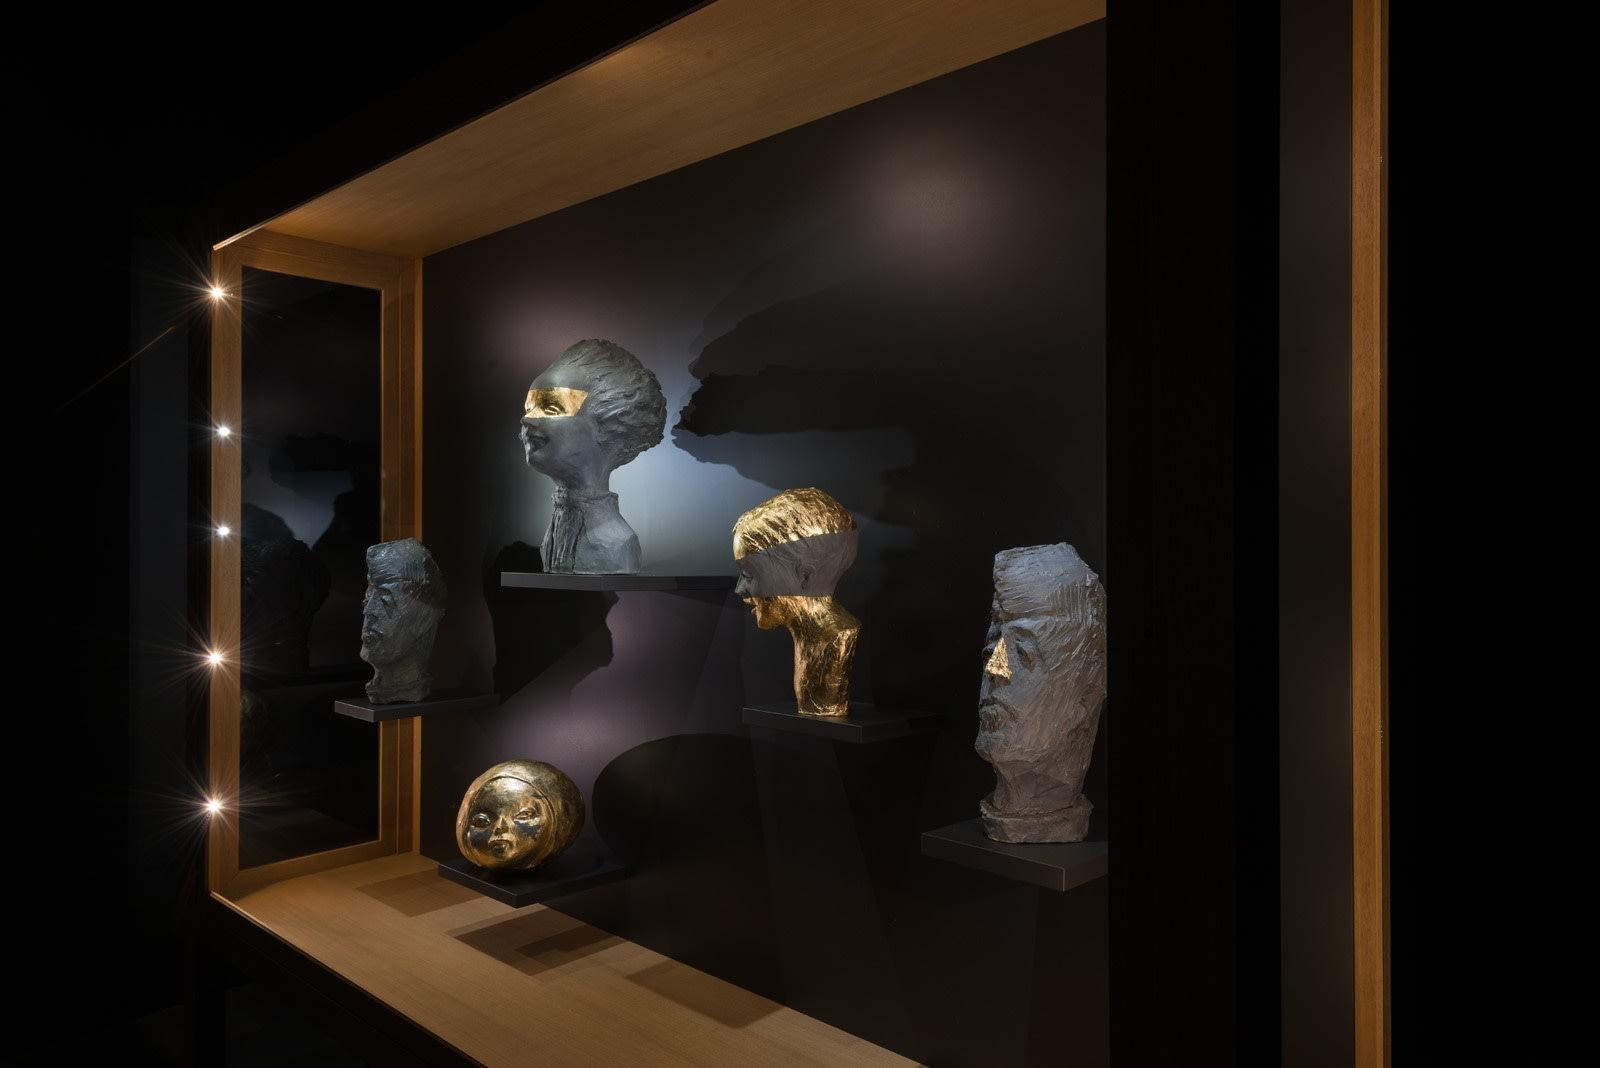 Galerija VARTAI, 2018 Installation shot from Janis Avotins solo exhibition